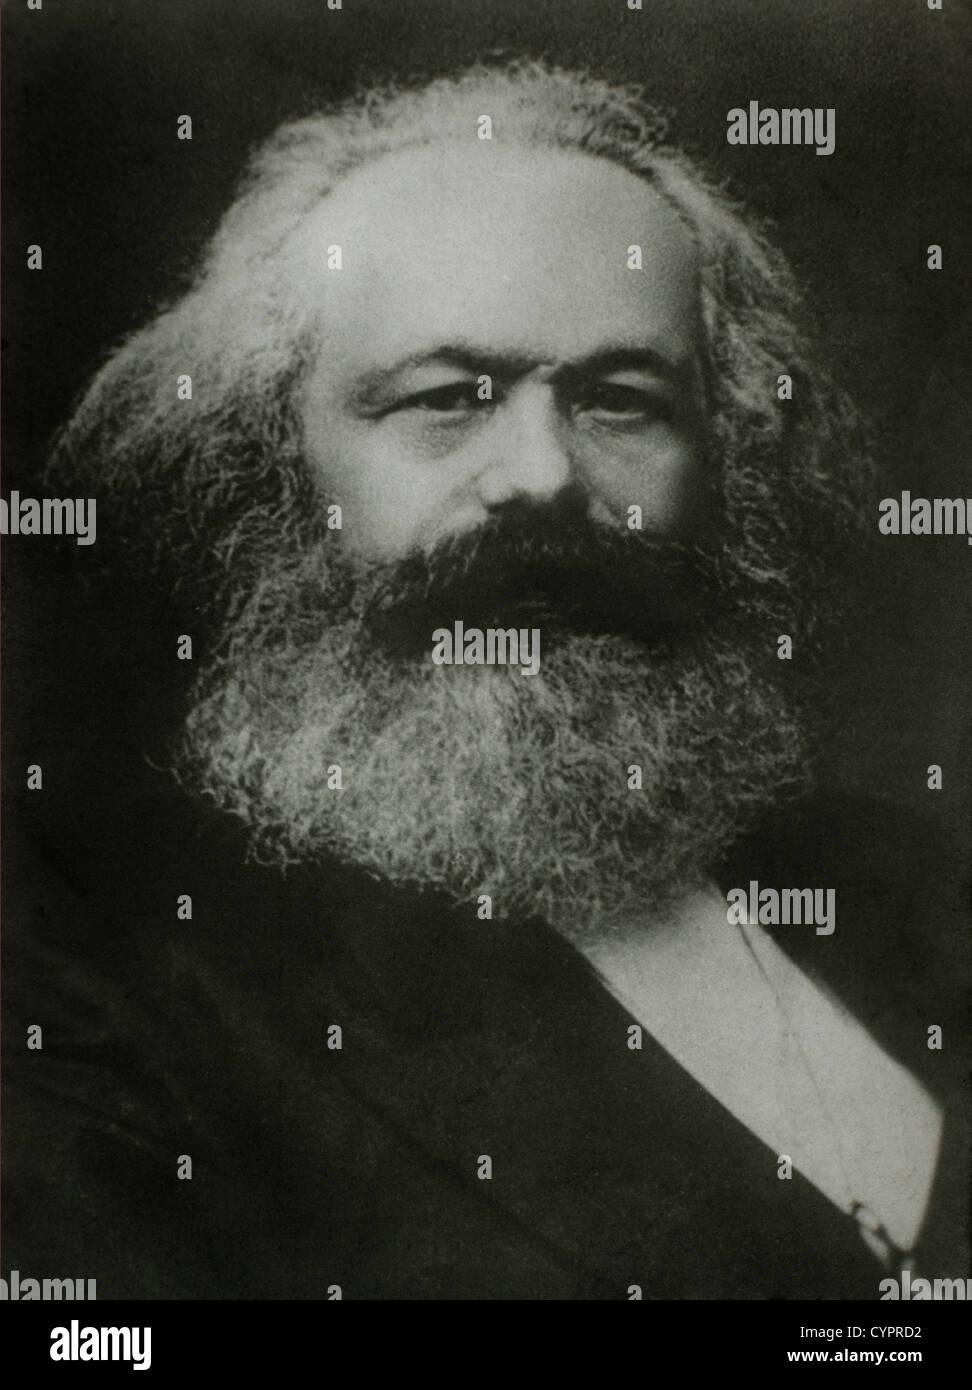 Karl Marx (1818-1883), German Philosopher,1875, Portrait - Stock Image